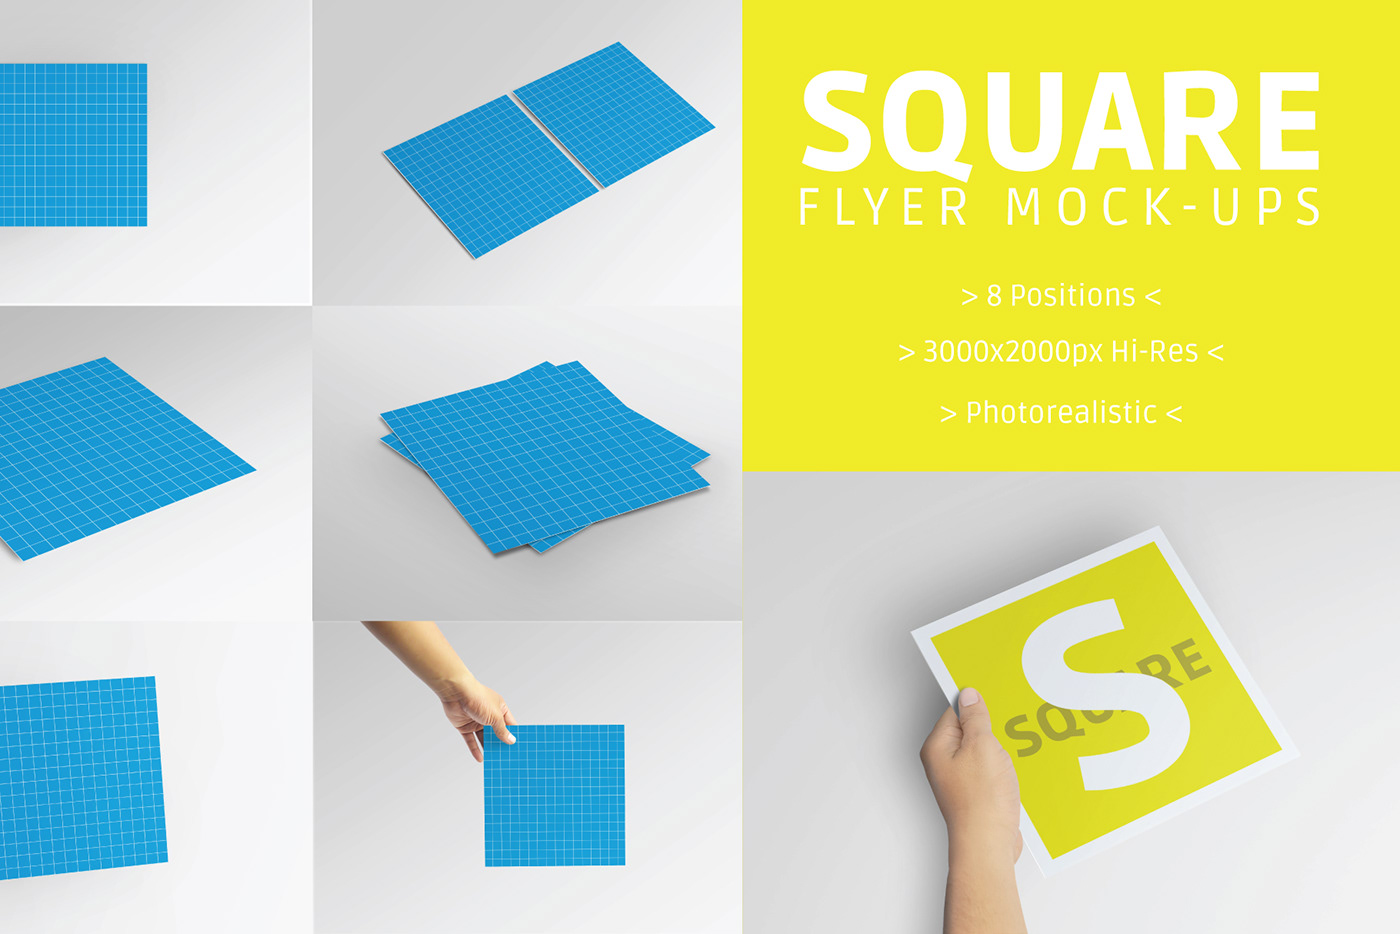 freebie free download psd Mockup flyer mockups branding  Stationery business idea photorealistic